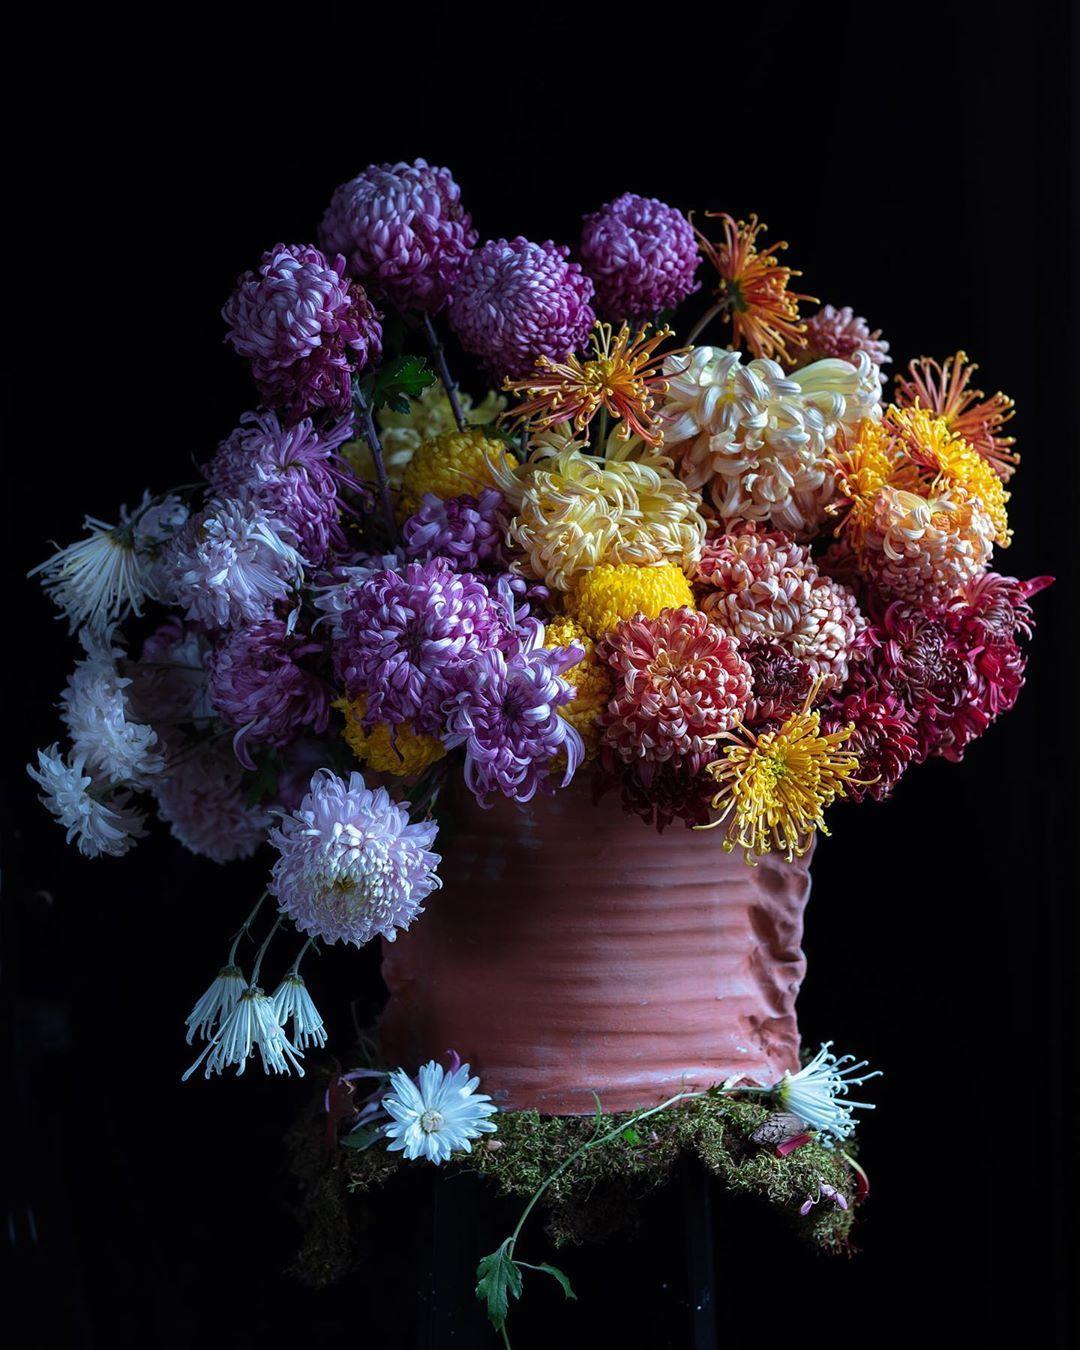 Frances Palmer On Instagram A Bit Of Ombre Before They All Fall Apart Chrysanthemum Garden Flowers Flowerstagram Terracotta Flowers Bloom Chrysanthemum